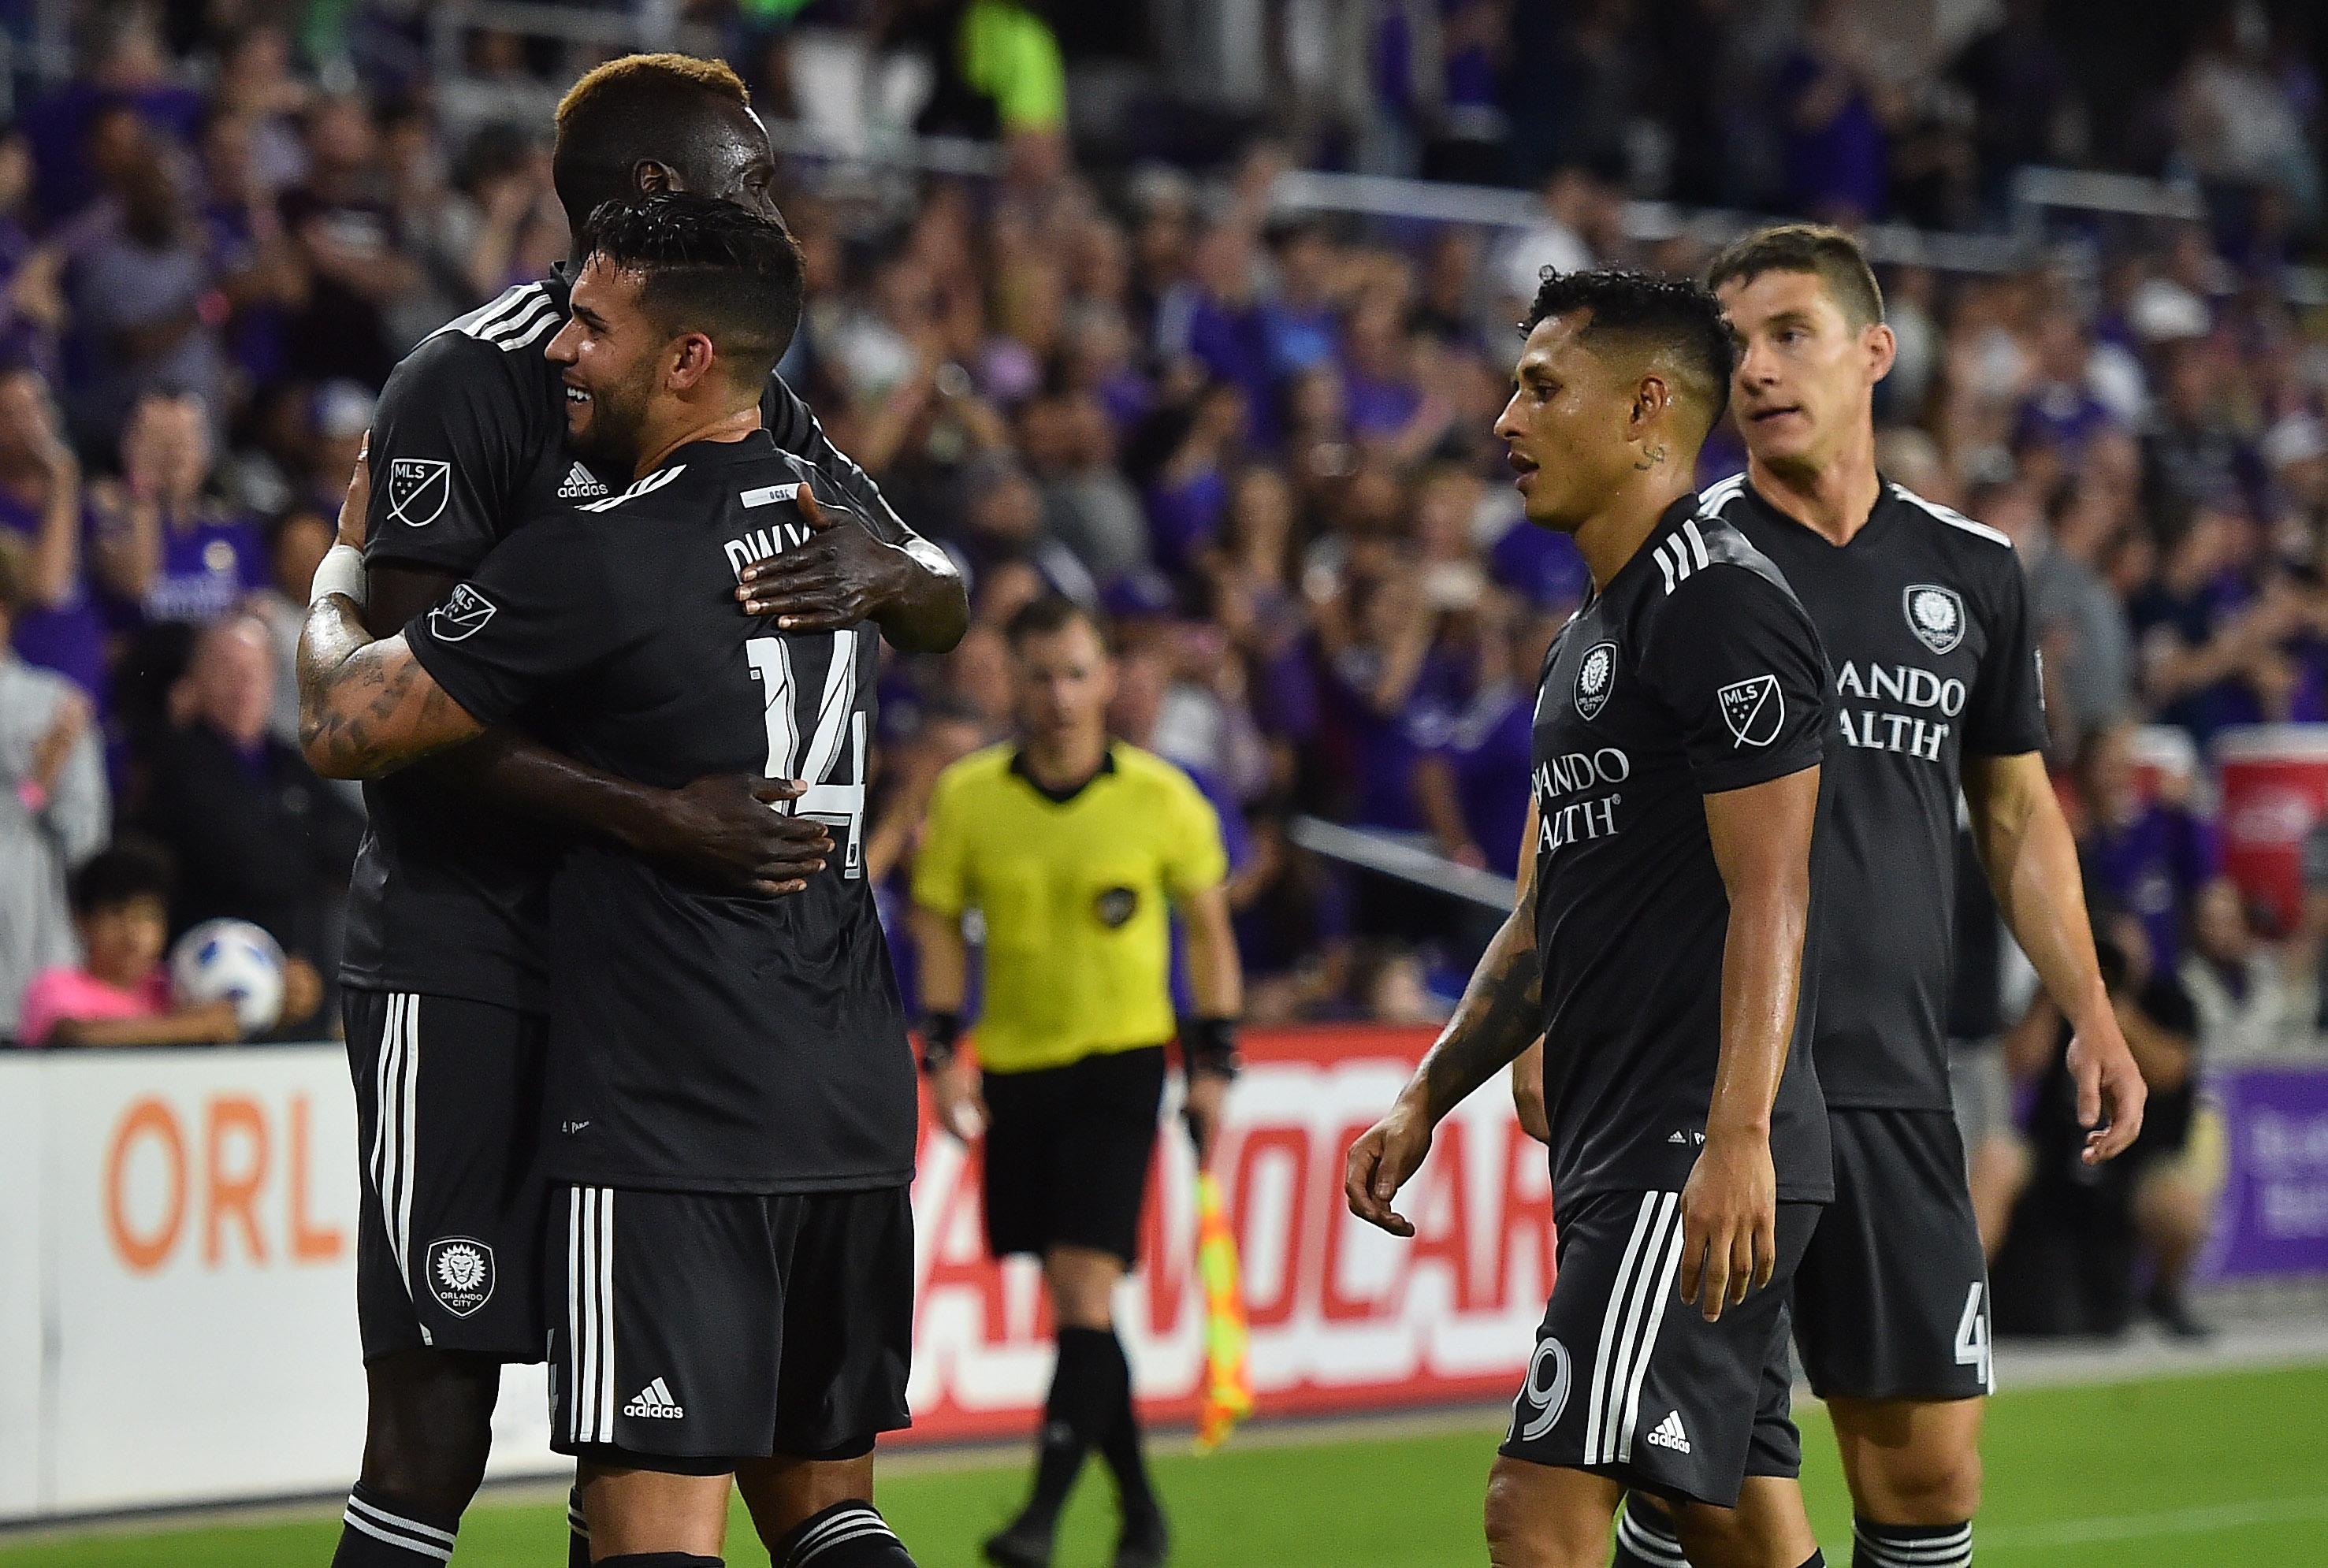 MLS: San Jose Earthquakes at Orlando City SC